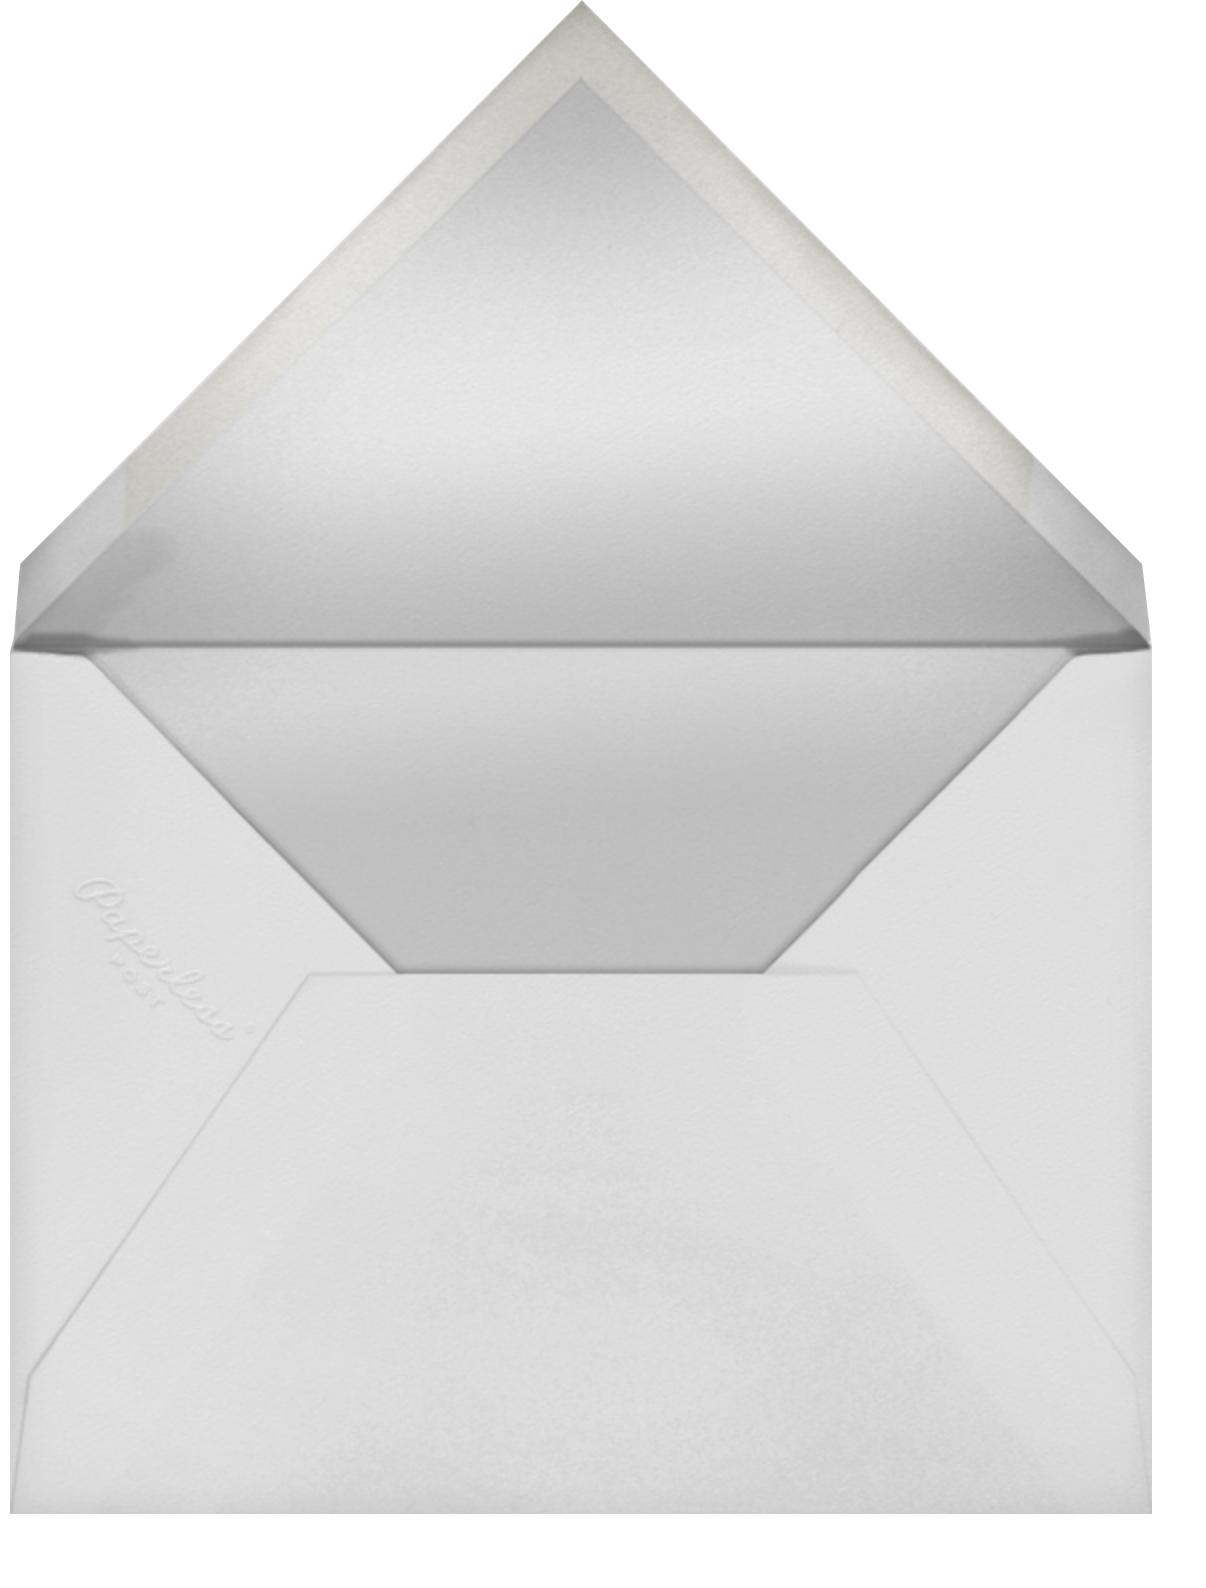 Faithful (Menu) - Apricot - Paperless Post - Menus - envelope back